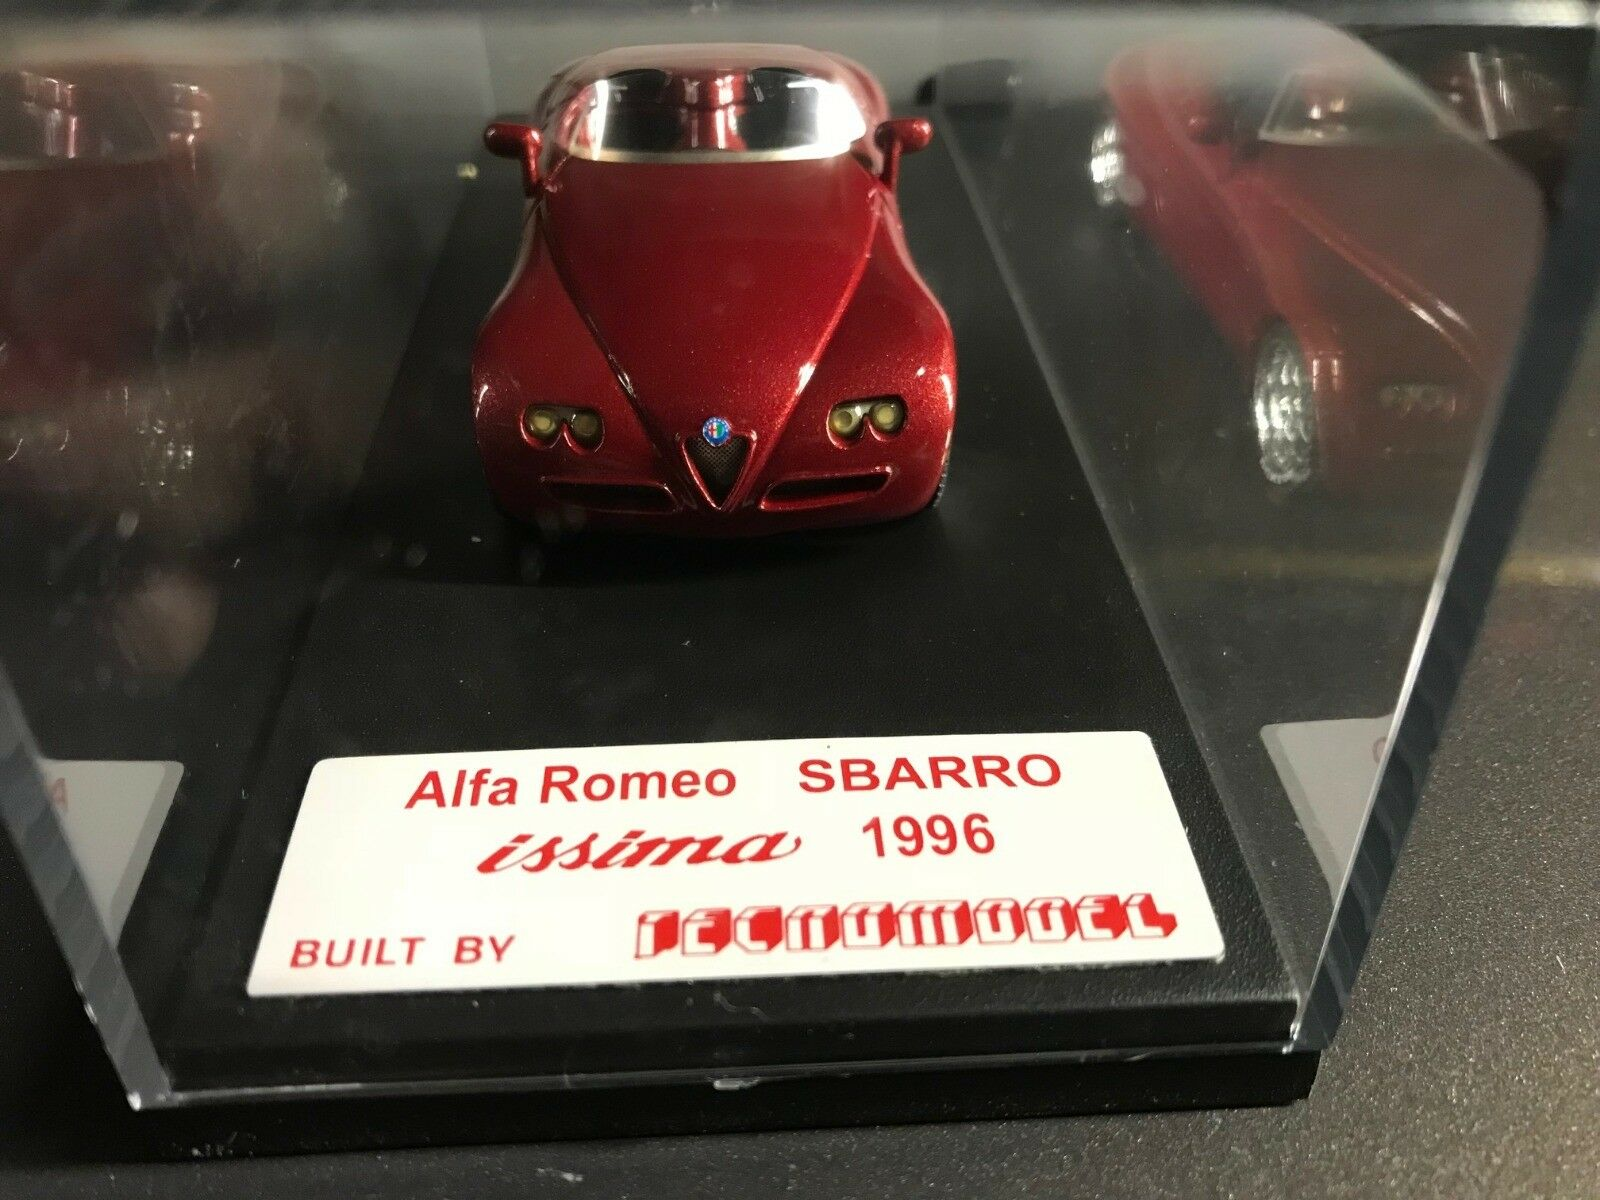 Alfa Romeo Sbarro Issima Tecnomodel